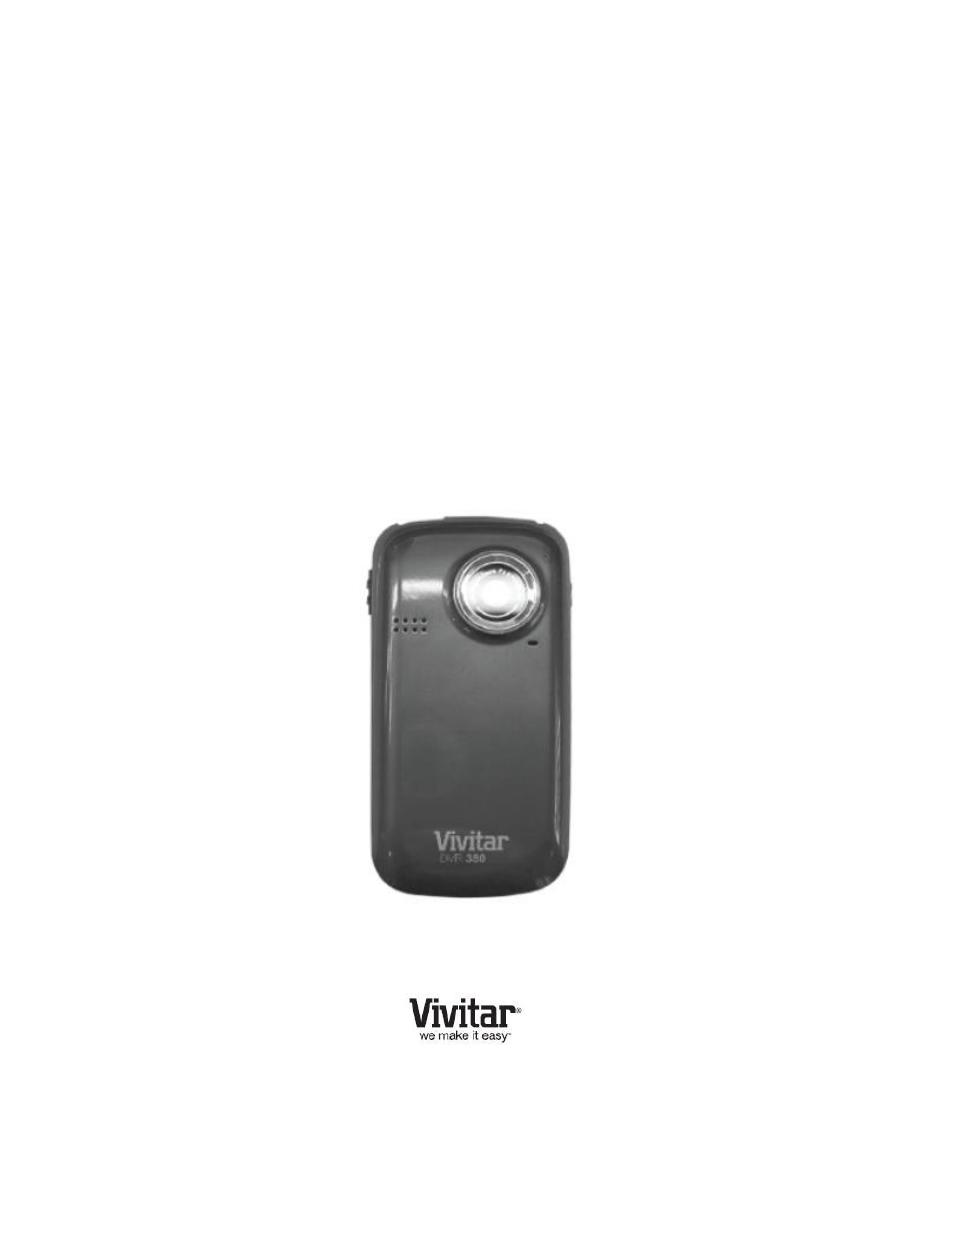 vivitar dvr 380 user manual 33 pages rh manualsdir com vivitar dvr 508 hd camcorder manual vivitar dvr786hd action camcorder manual